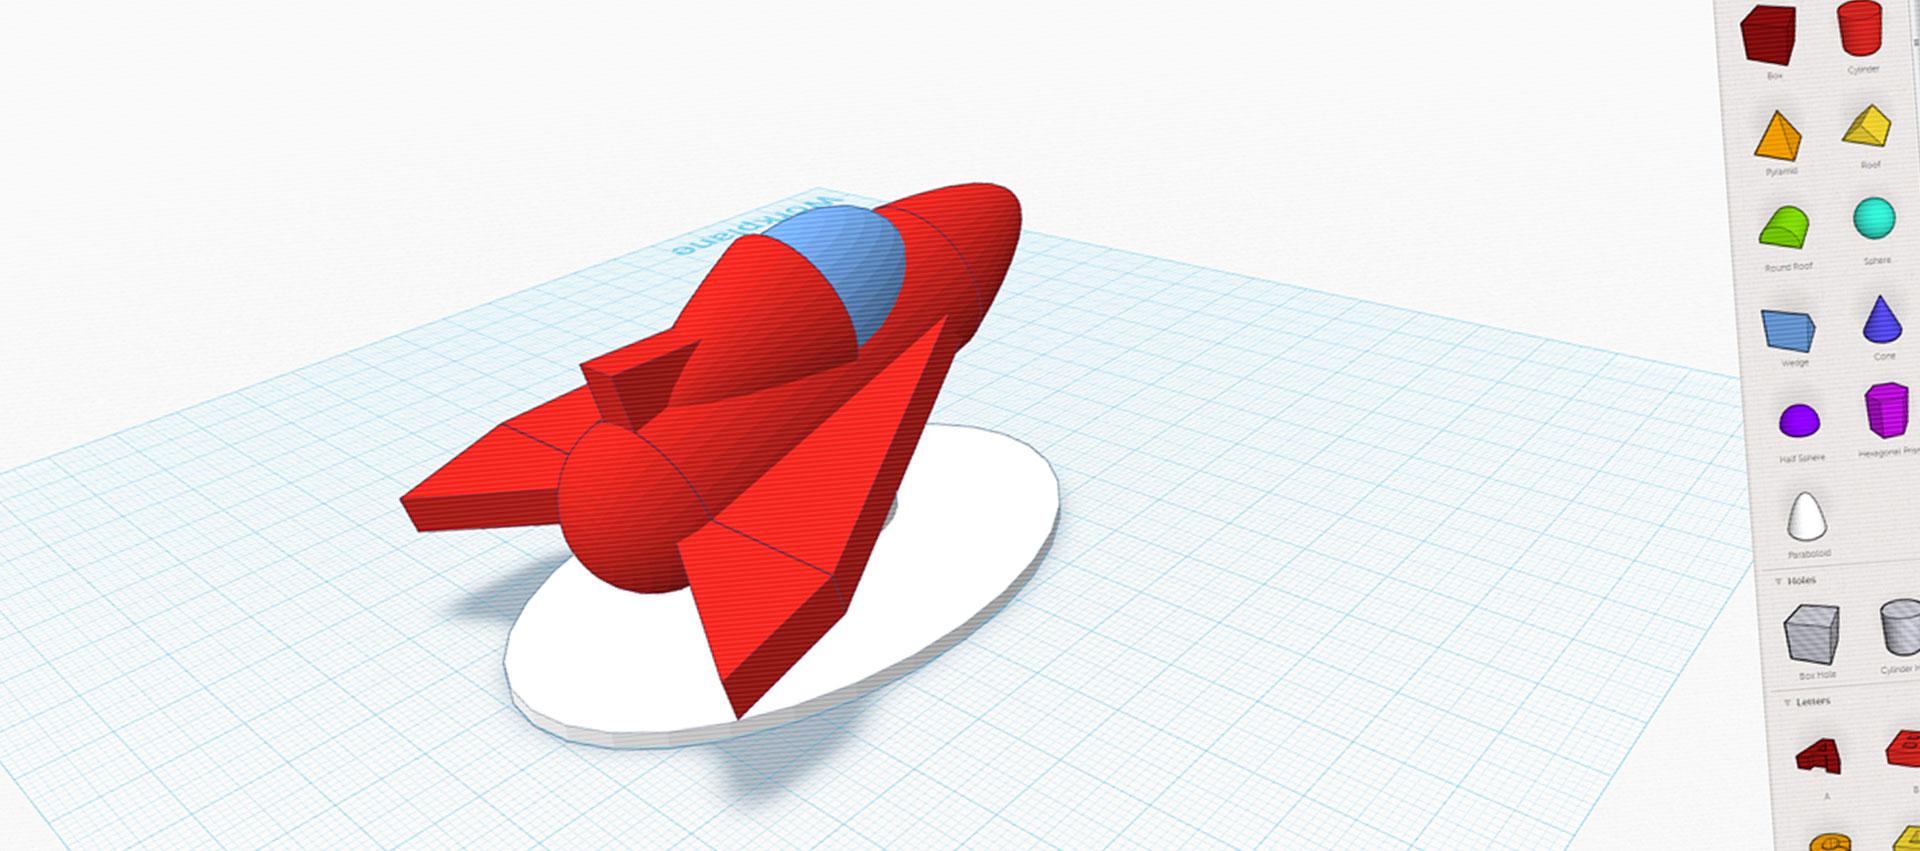 Autodesk compra Tinkercad